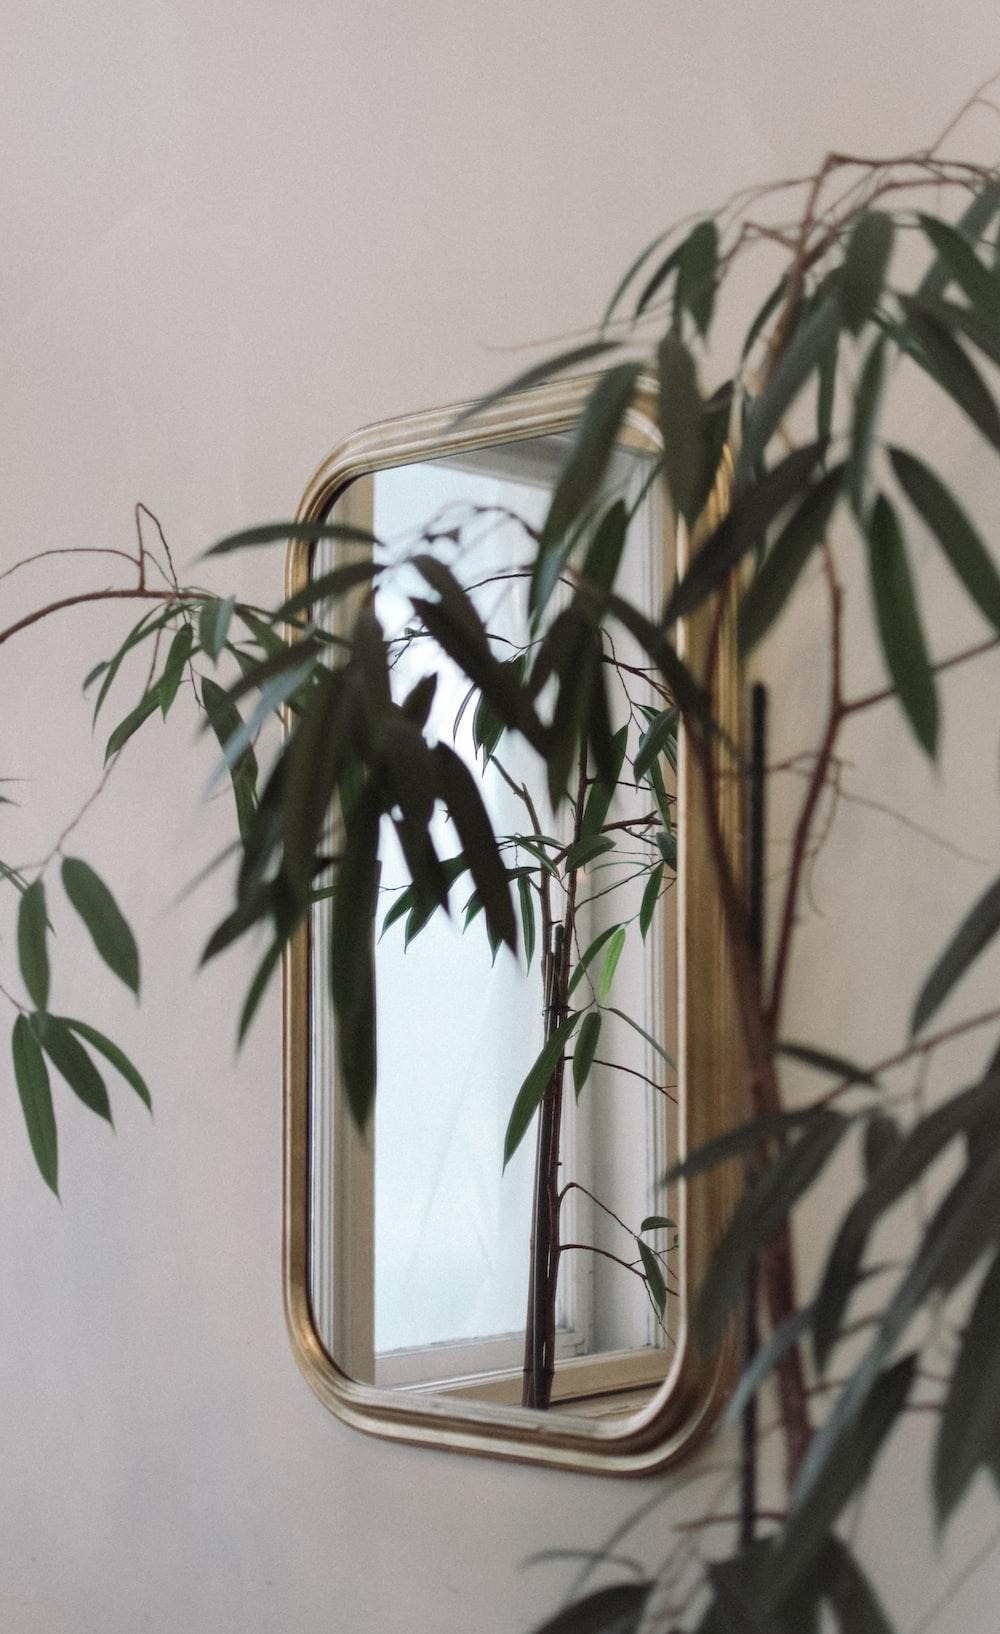 gold framed mirror near plant